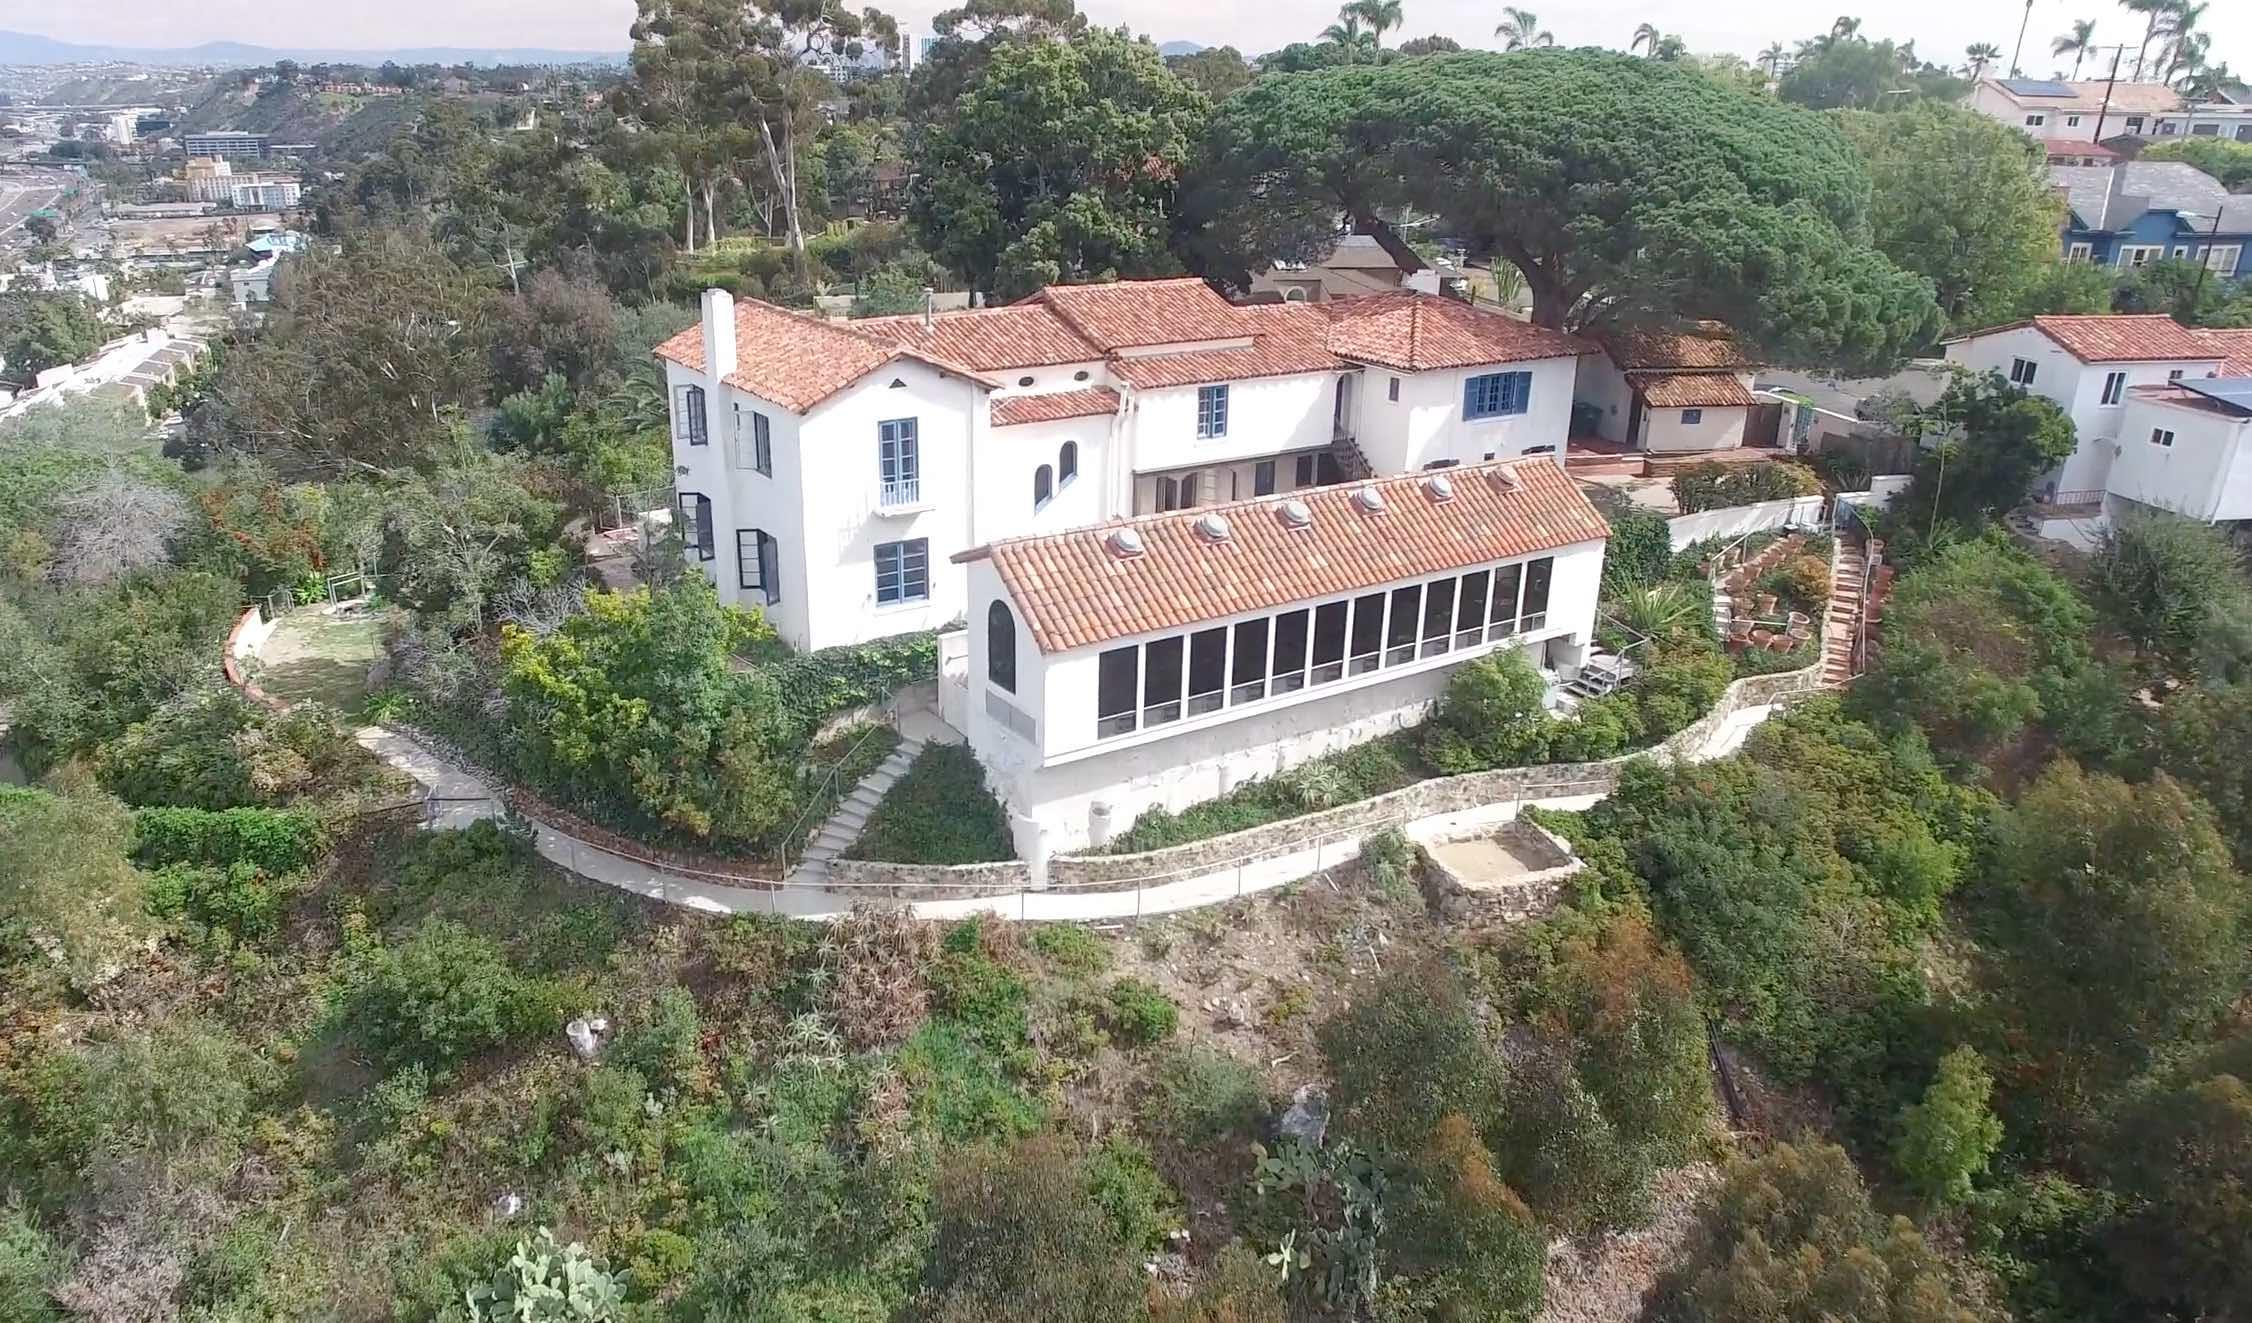 Villa-Hermosa-Aerial-5